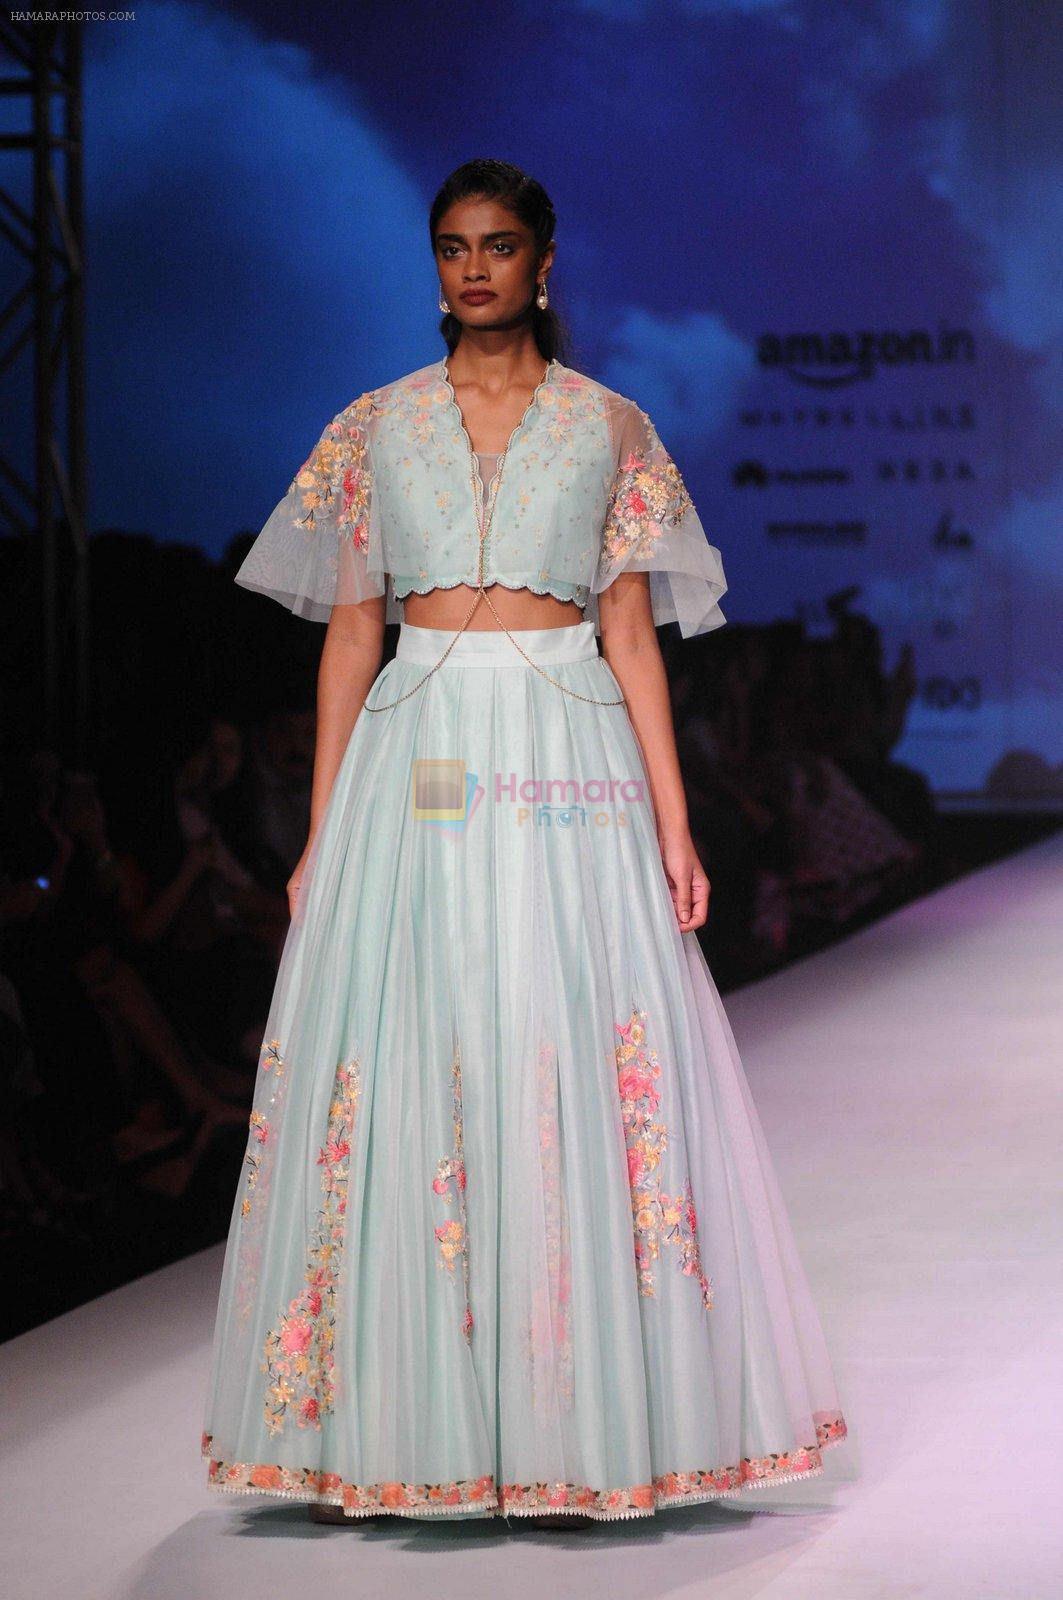 Model walk the ramp for Mandira Wrik's show at Amazon India Fashion Week on 15th Oct 2016